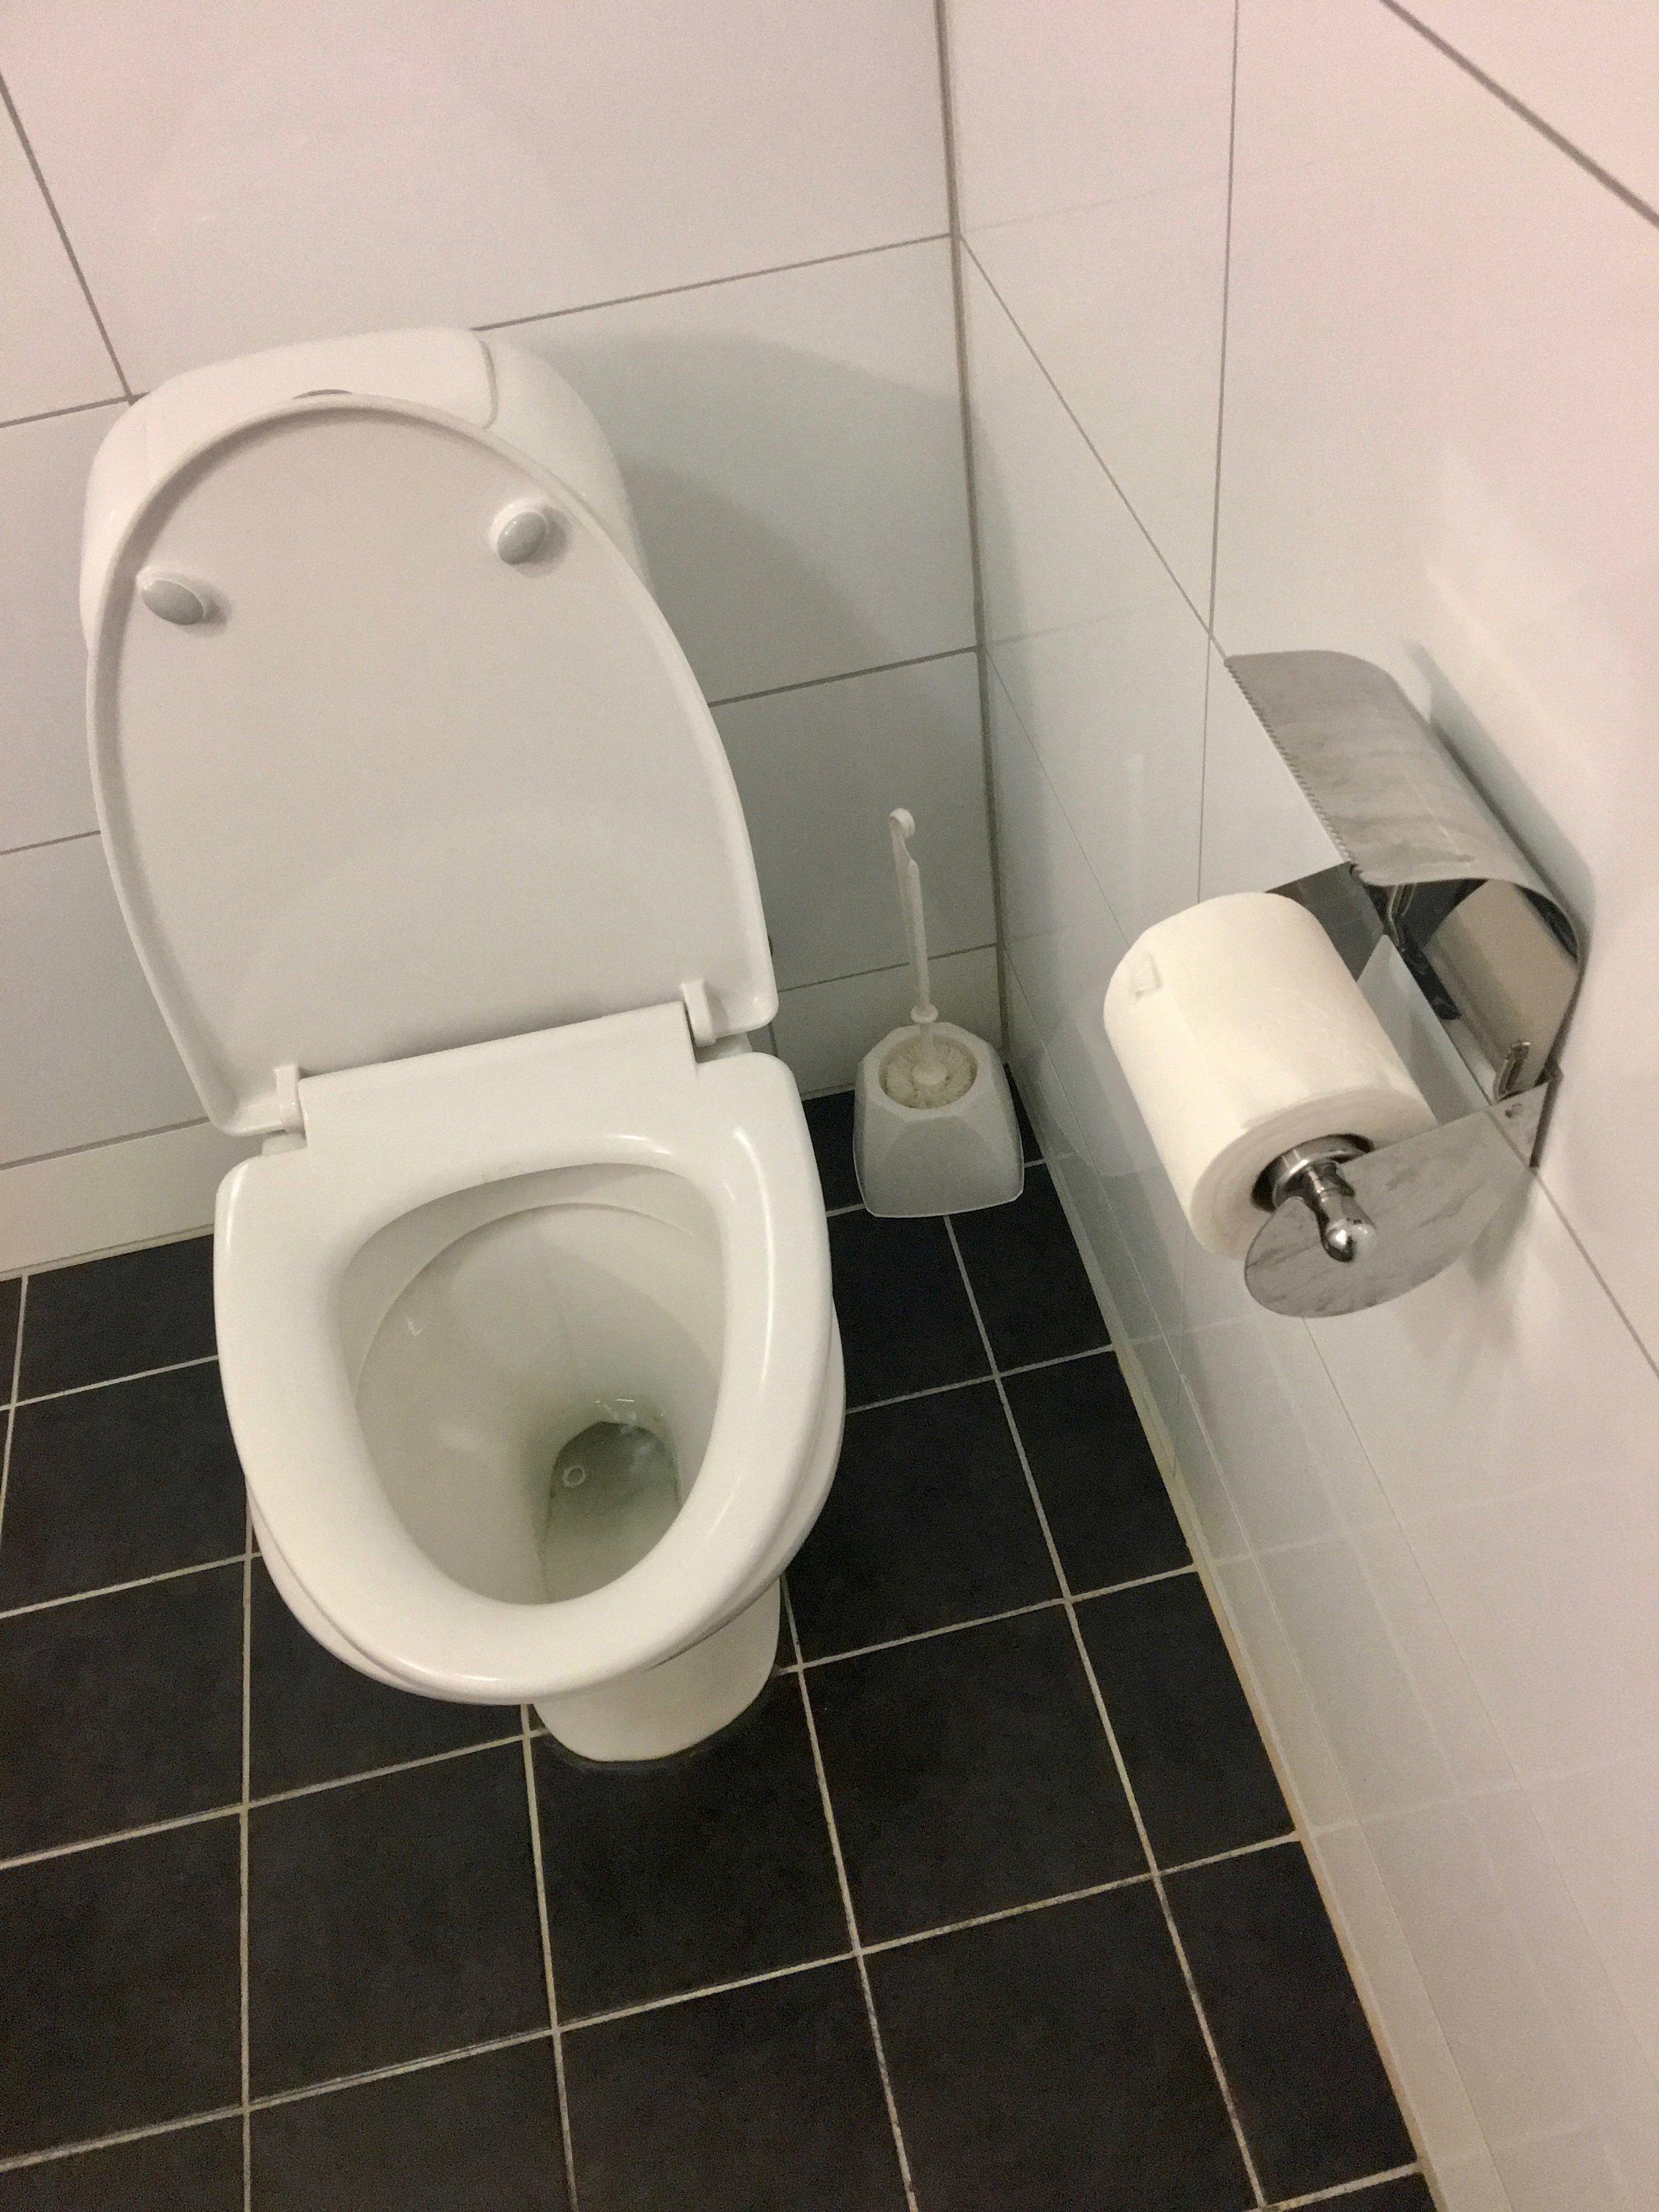 Toilet,_toilet_paper,_toilet_brush,_etc._in_a_bathroom_in_small_hotel_in_Tysnes,_Hordaland,_Norway_2018-03-18_C._Also_wall_and_floor_tiles.jpg